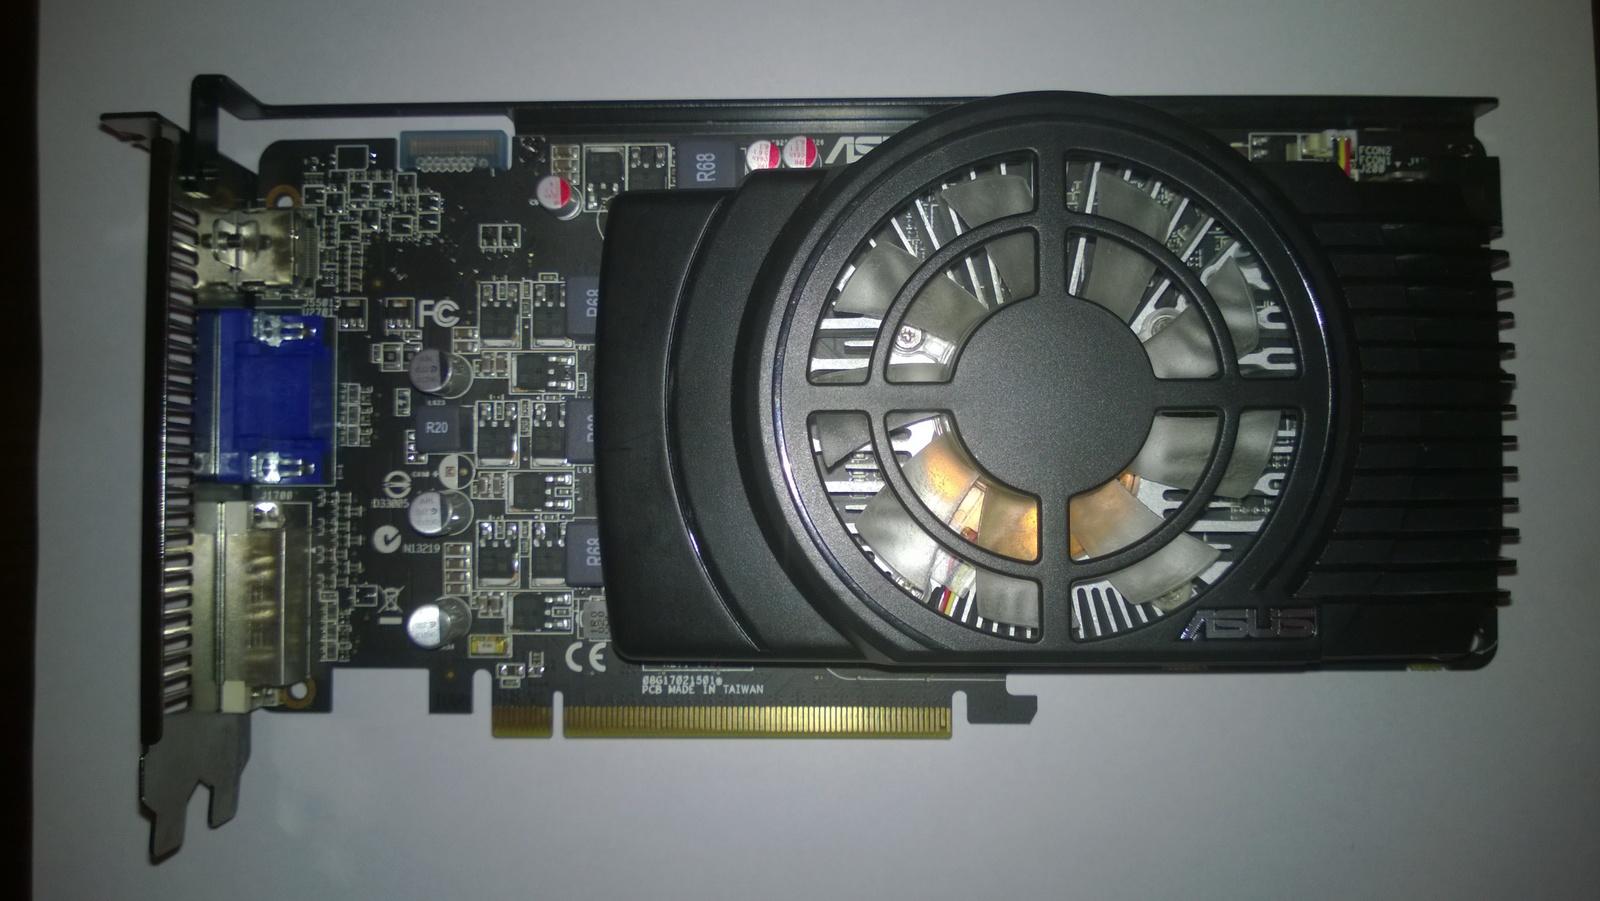 [Sprzedam] Radeon HD 5770 1GB DDR5 128-bit Asus EAH5770 CUcore/G/2DI/1GD5